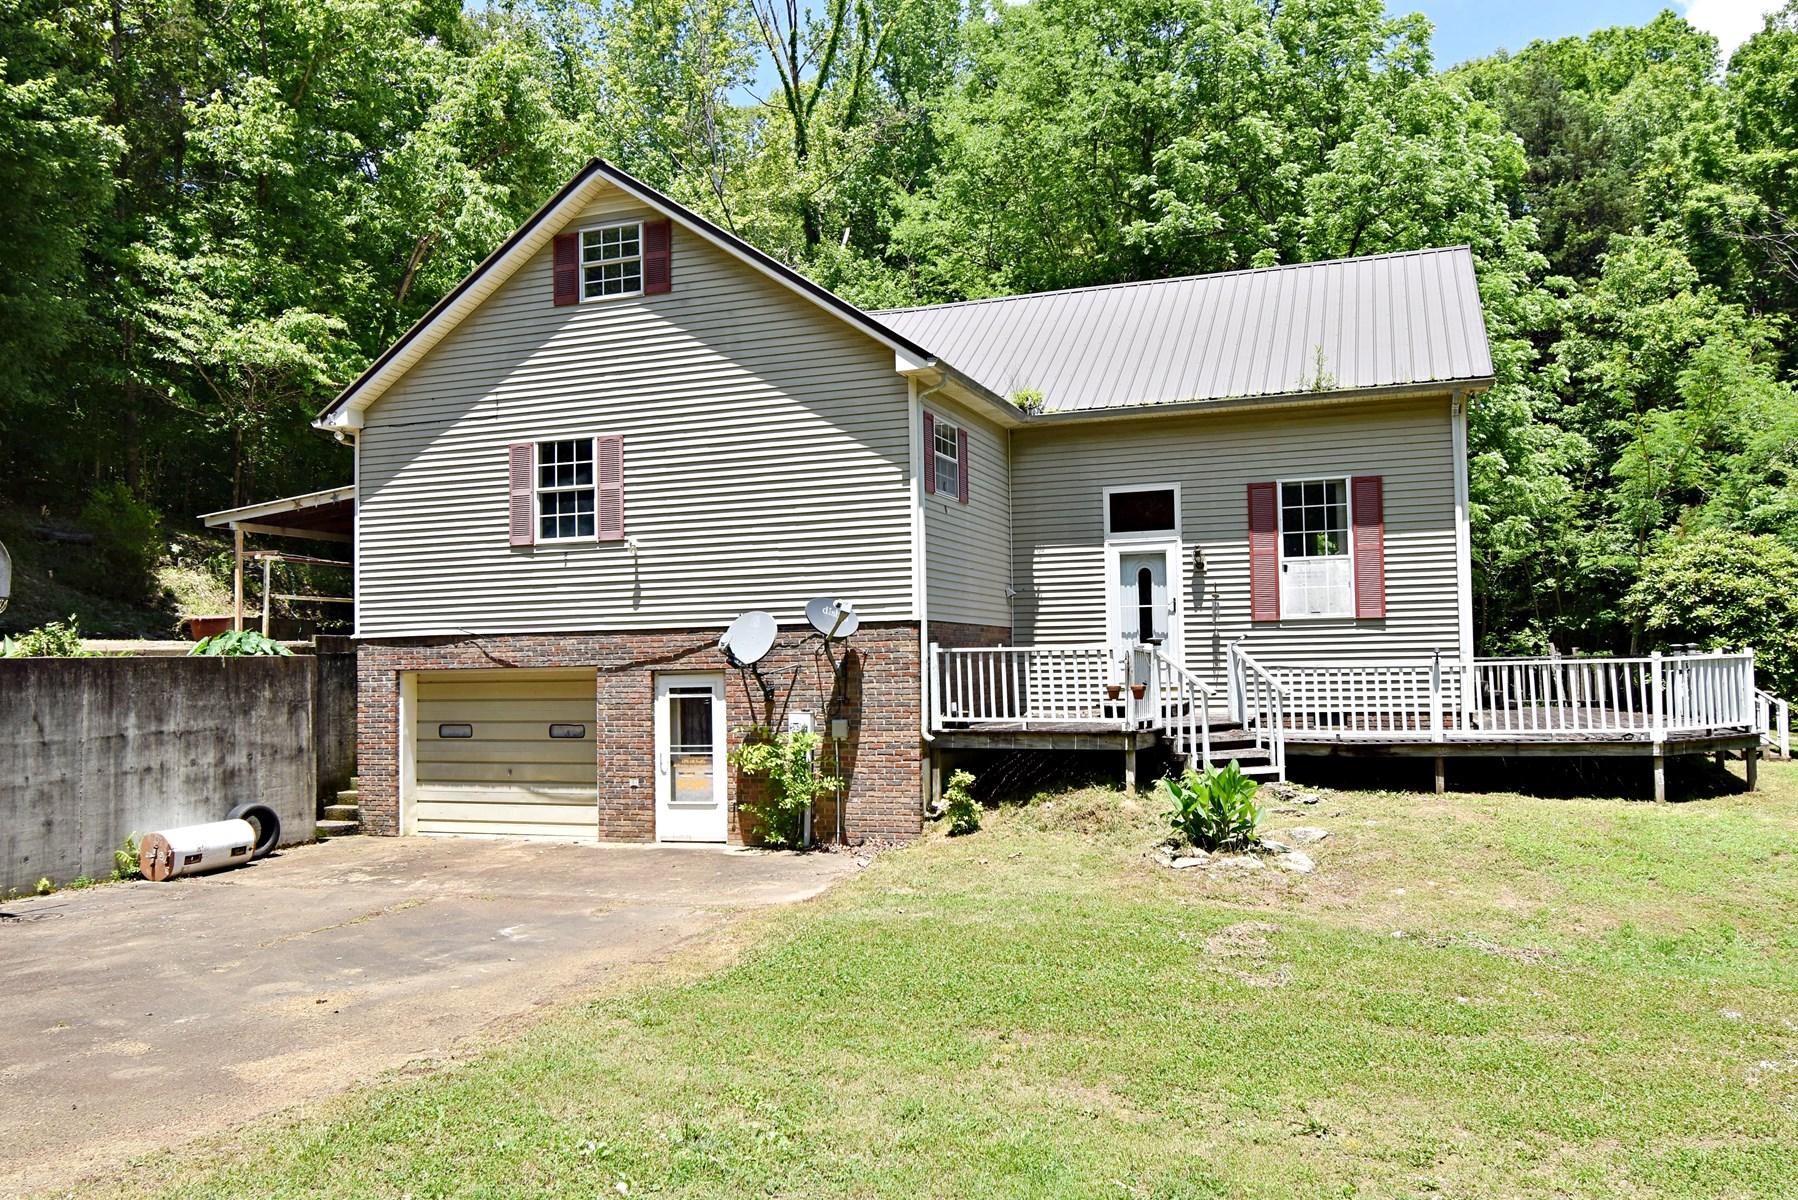 3 Bedroom 4 Bath Home 2.88 Ac $195,000